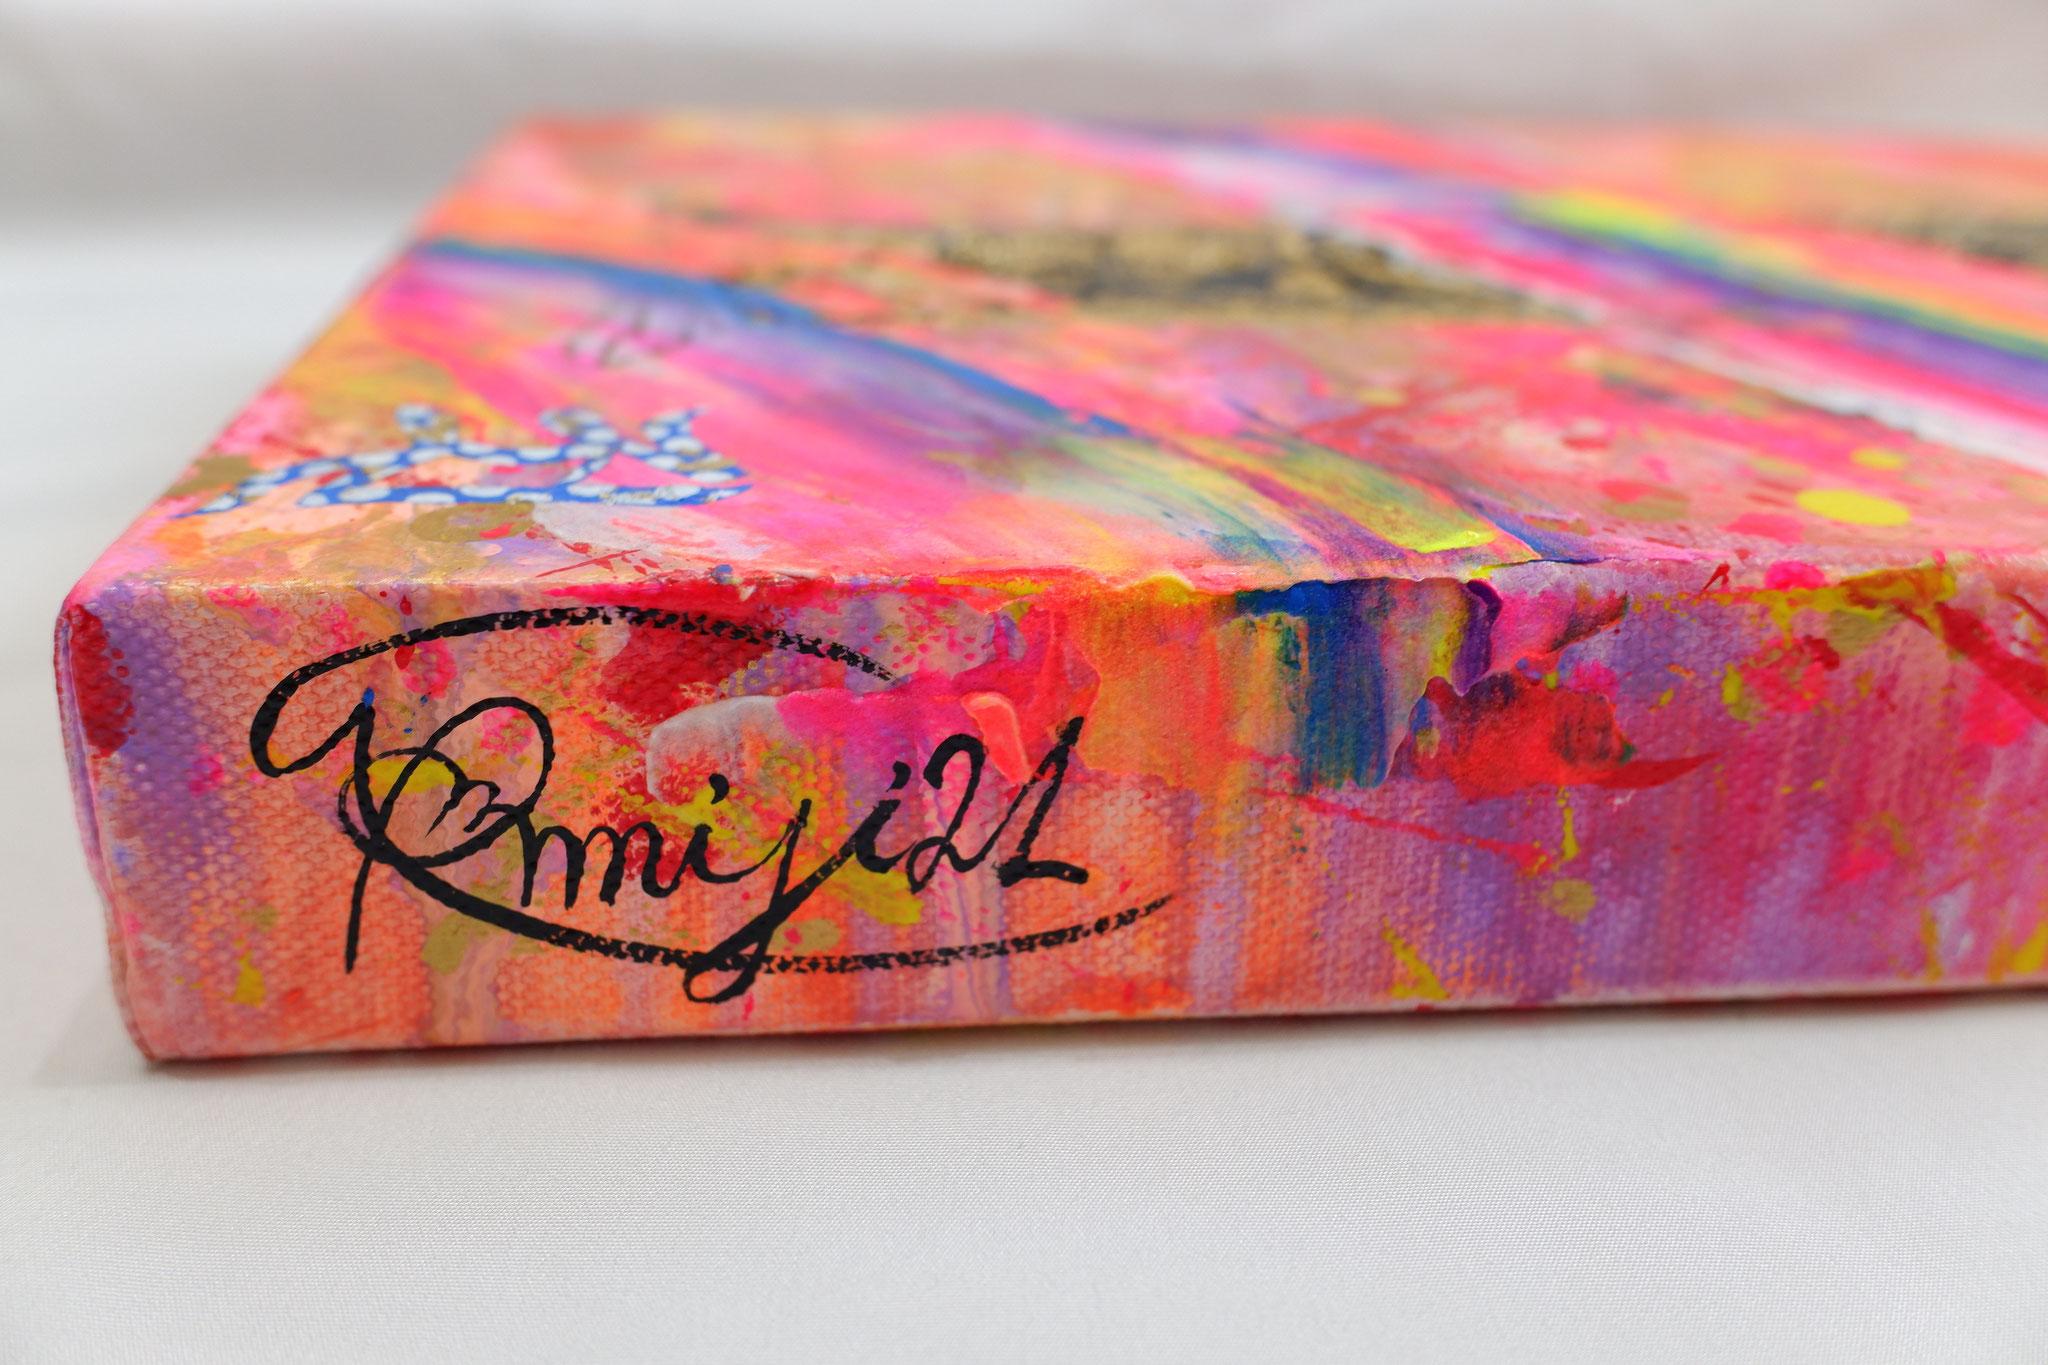 『 amsumat 〜日光菩薩〜 』acrylic , mixed-media, polycarbonate (mirror) on canvas (60.0cm×20.0cm)